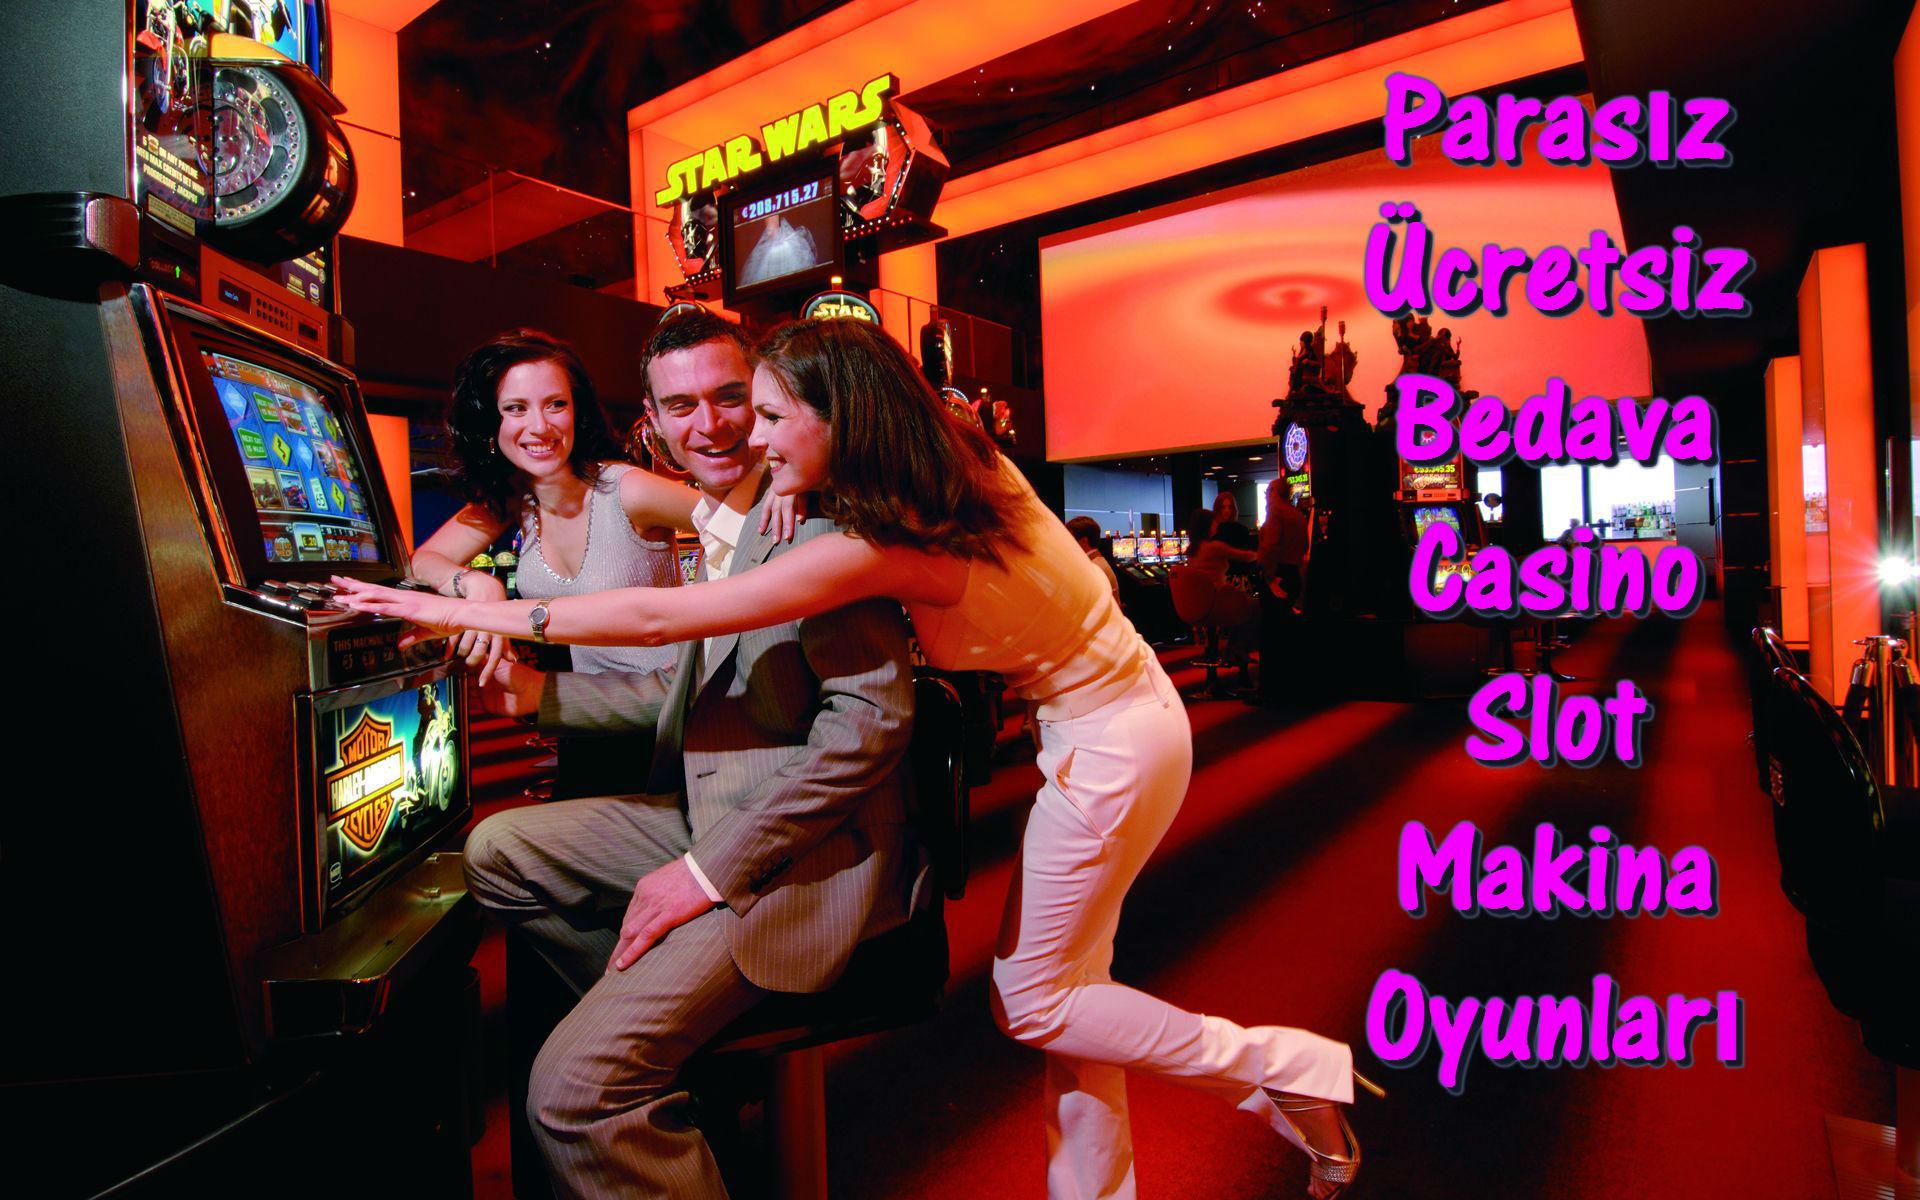 Bedava Casino Slot Oyunları, Ücretsiz Slot Makina Oyunları, Slot Makina Oyunları Parasız, Bedava Slot Makina Oyunları, Bedava Slot Oyna Book Of Ra